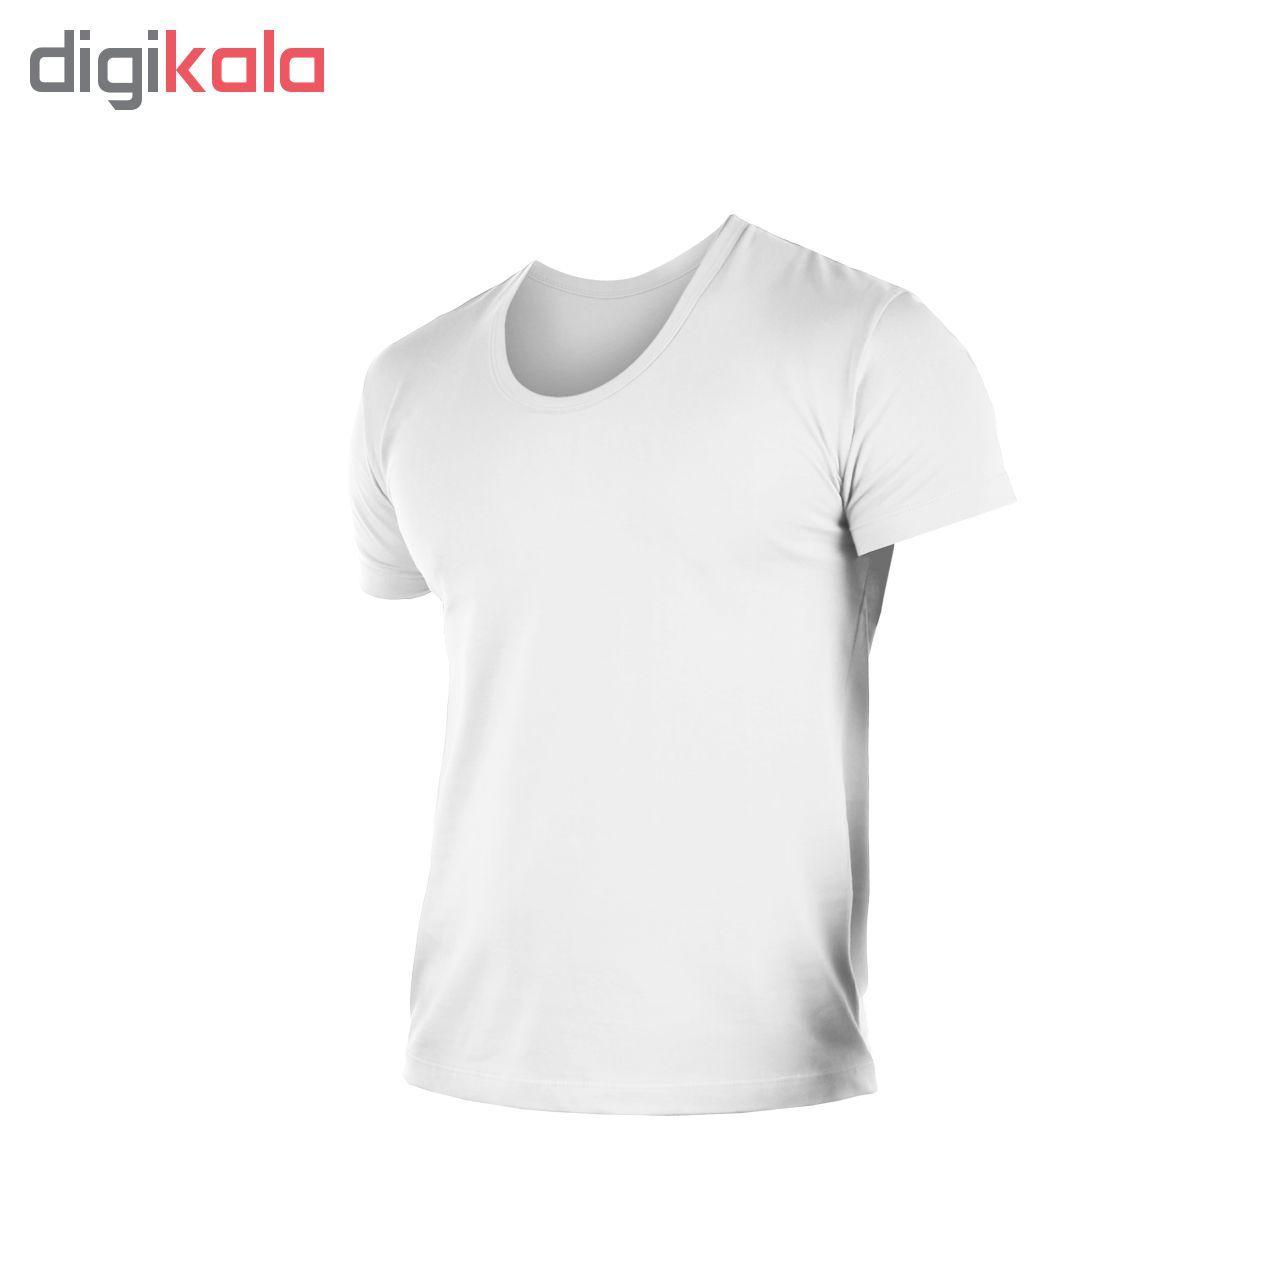 زیرپوش مردانه کیان تن پوش مدل U Neck Shirt Classic W main 1 1